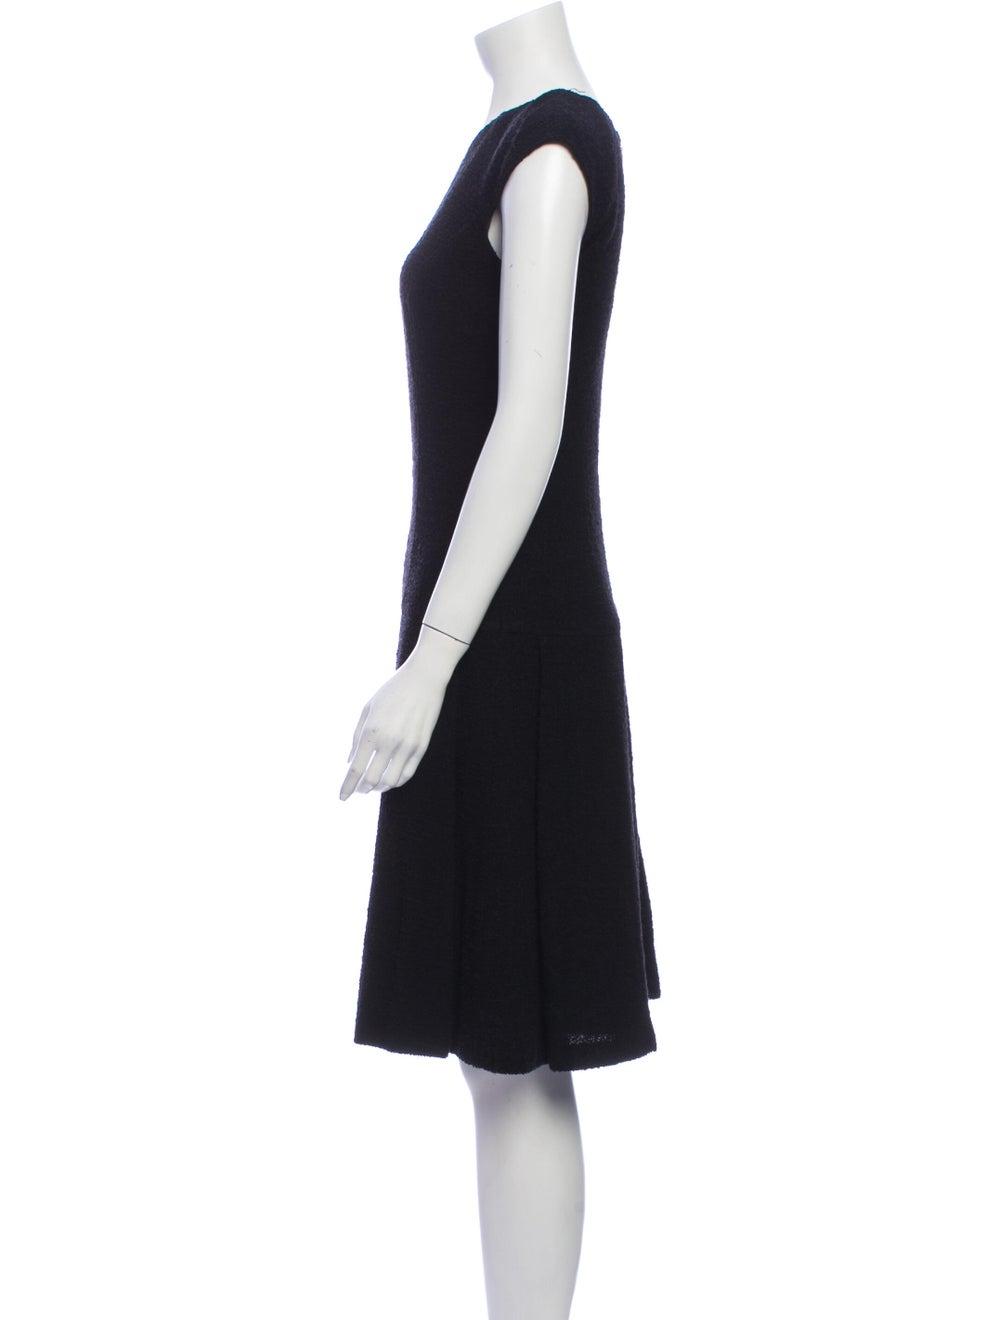 Oscar de la Renta 2008 Knee-Length Dress Black - image 2